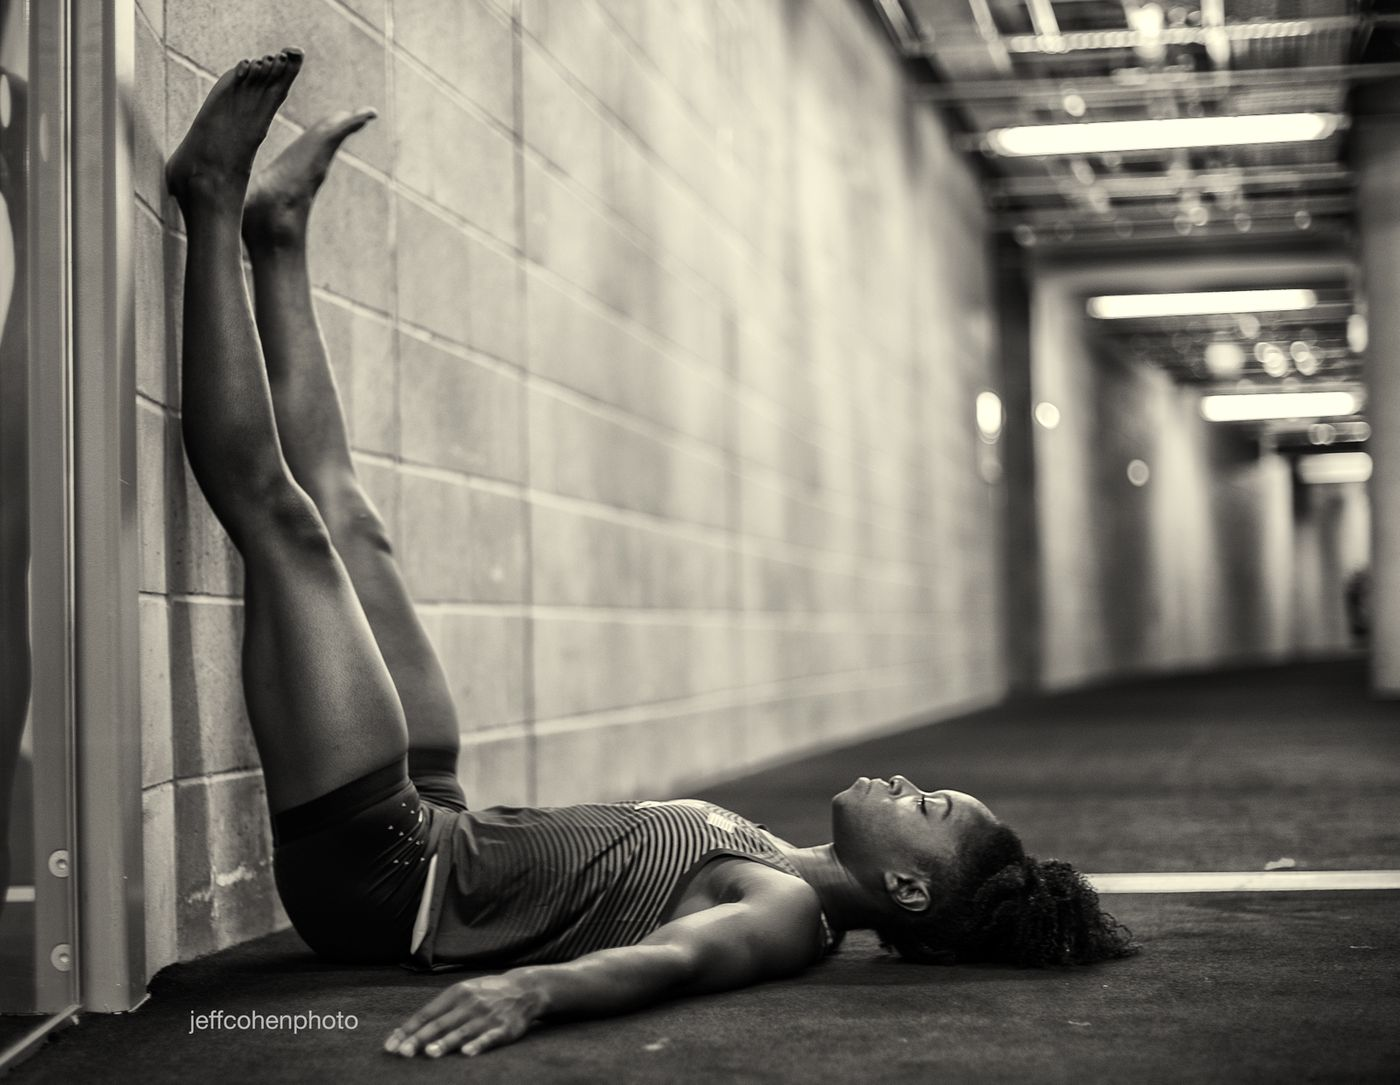 2017-IAAF-WC-London-pre-meet-tianna-bartoletta-legs-up-jeff-cohen-photo--215-web.jpg